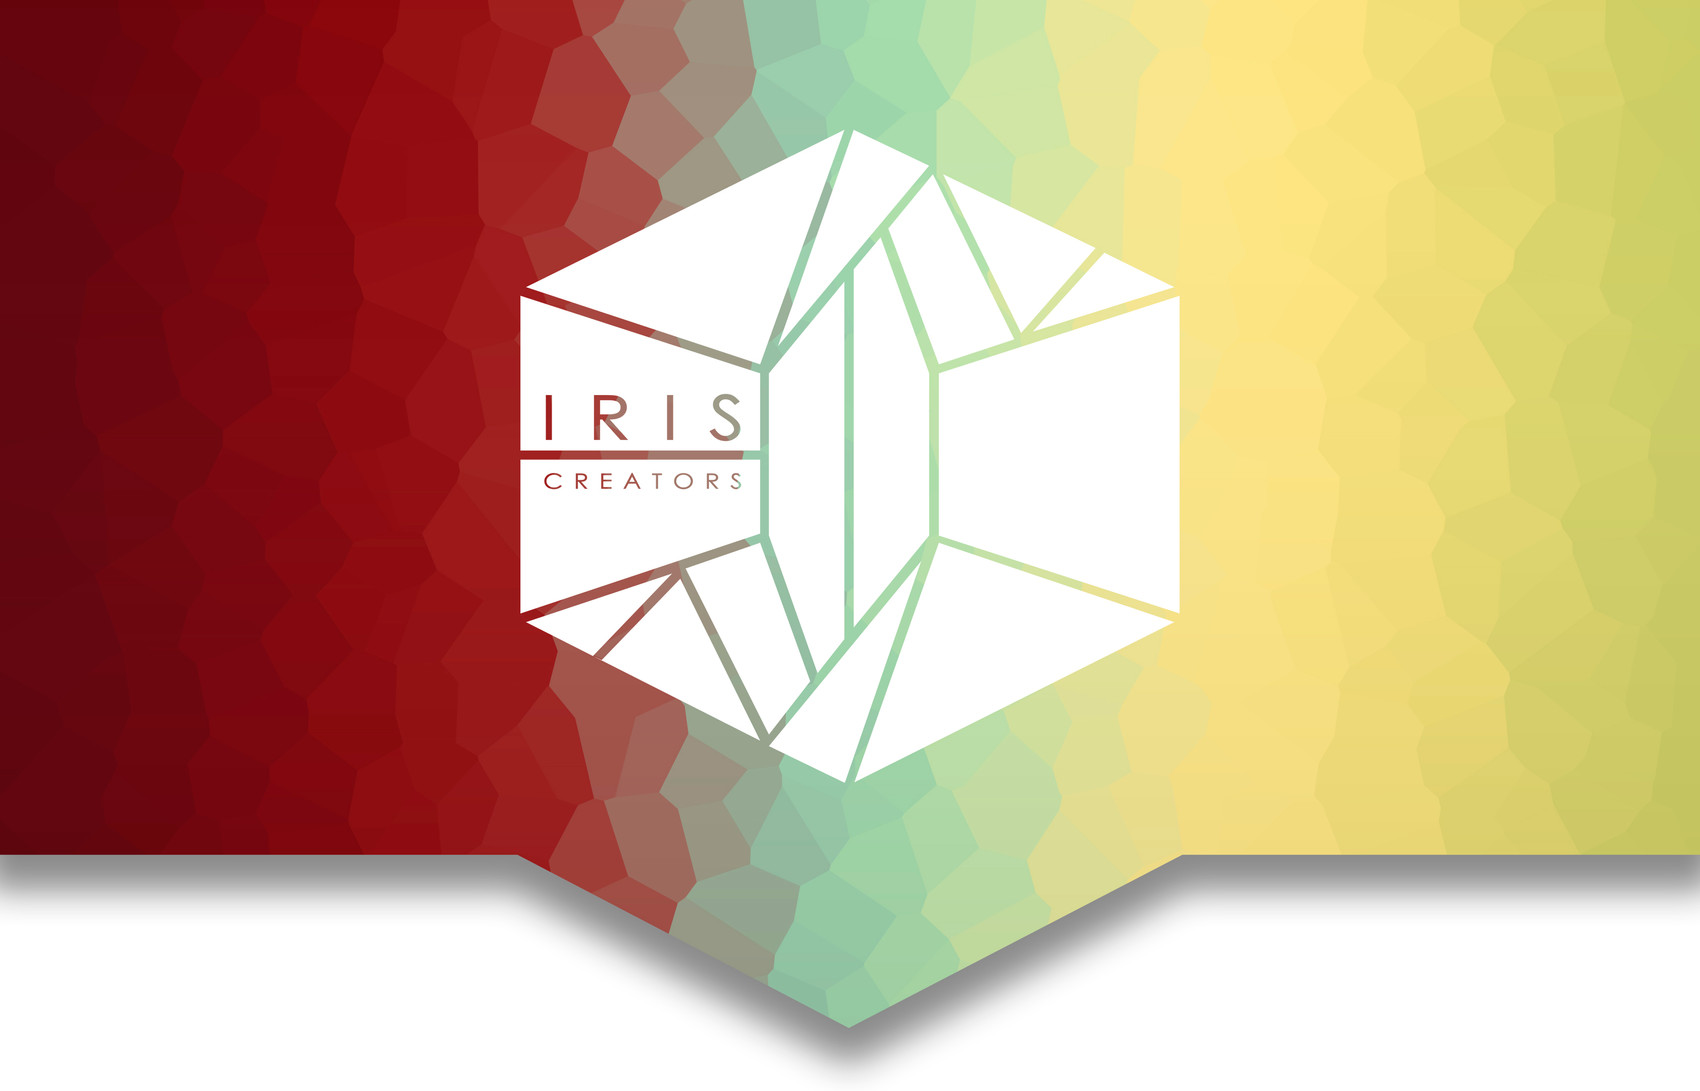 IRIS web 1clear.jpg